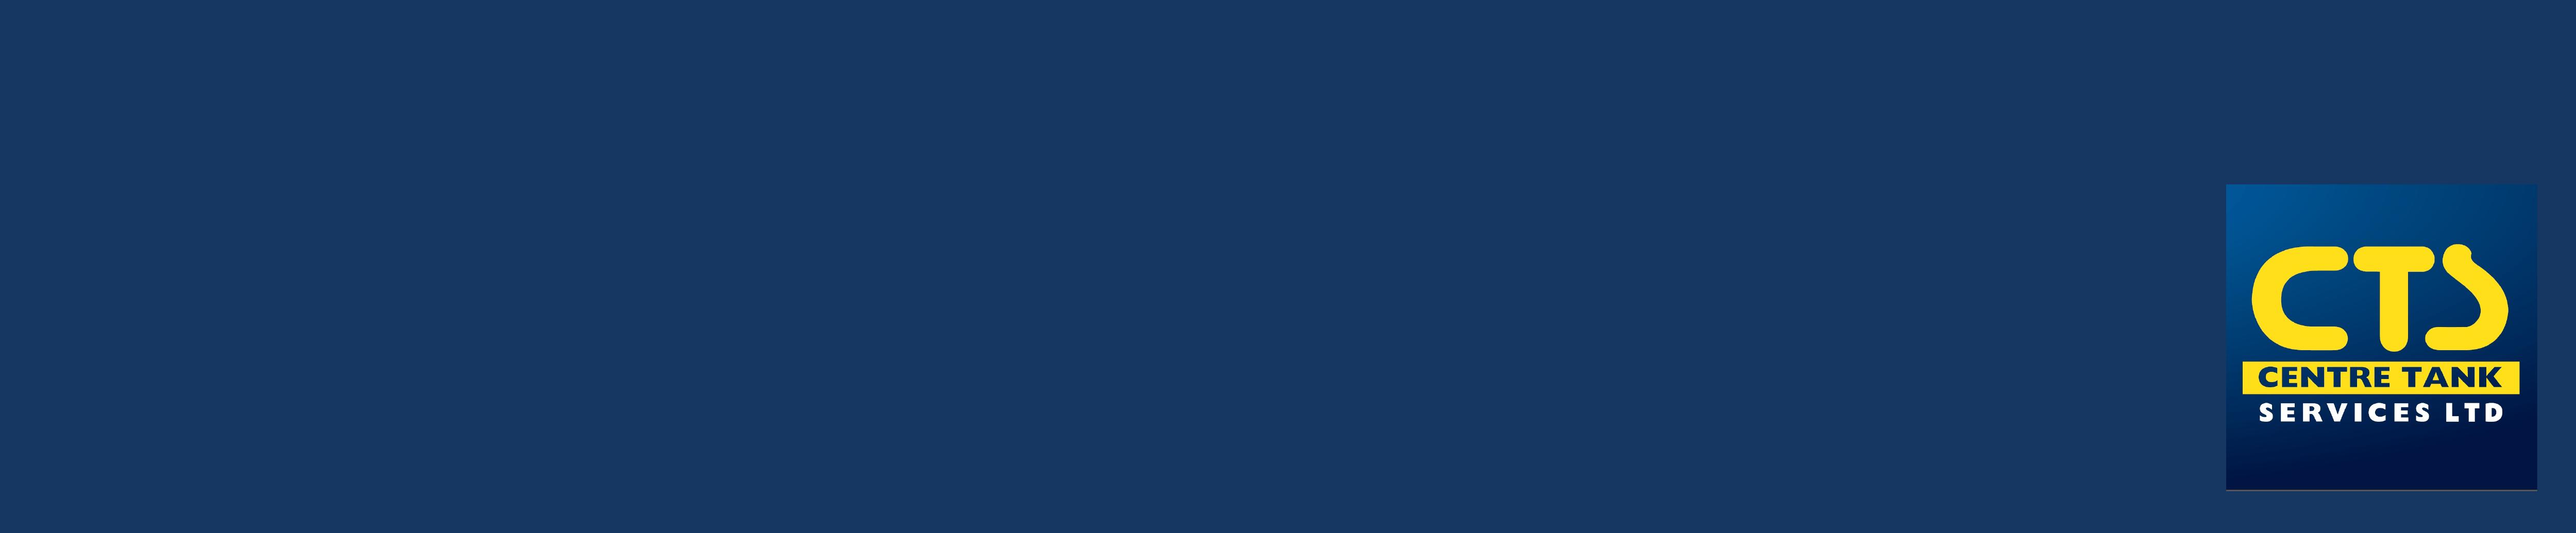 CTS page header logo banner_2